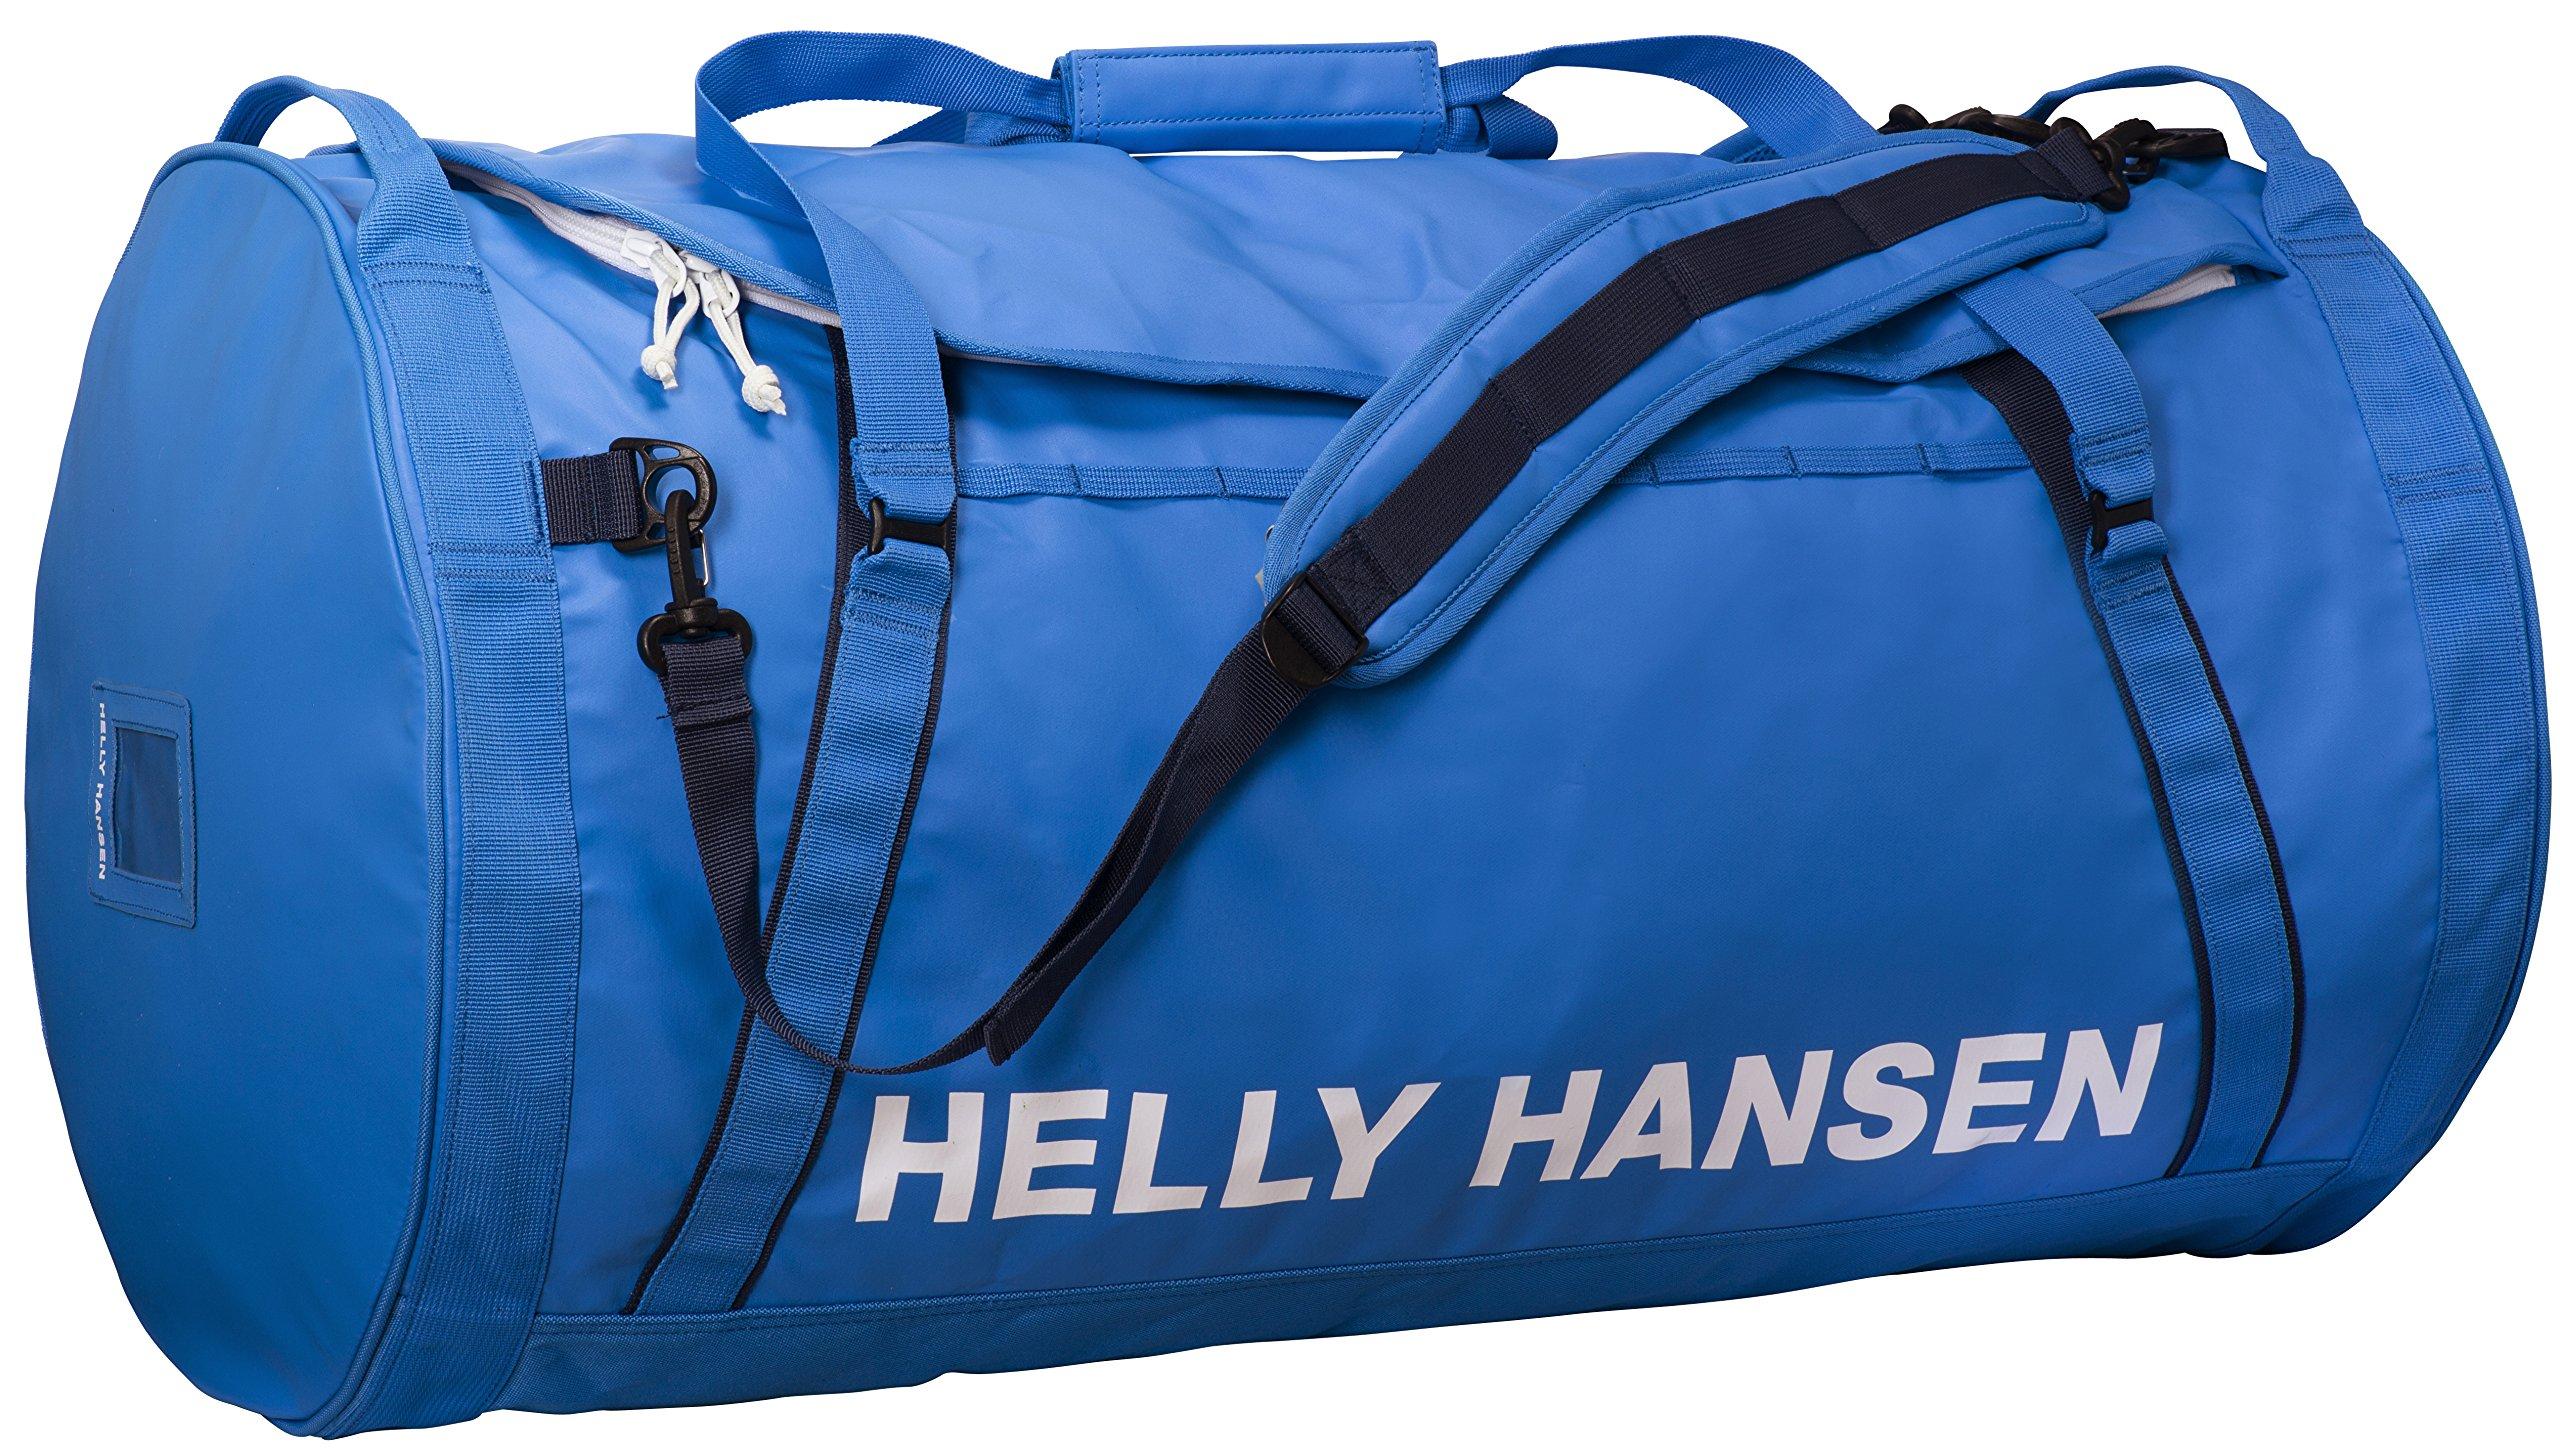 Helly Hansen Duffel 2 Water Resistant Packable Bag with Optional Backpack Straps, 70-liter (Meduim), 535 Racer Blue